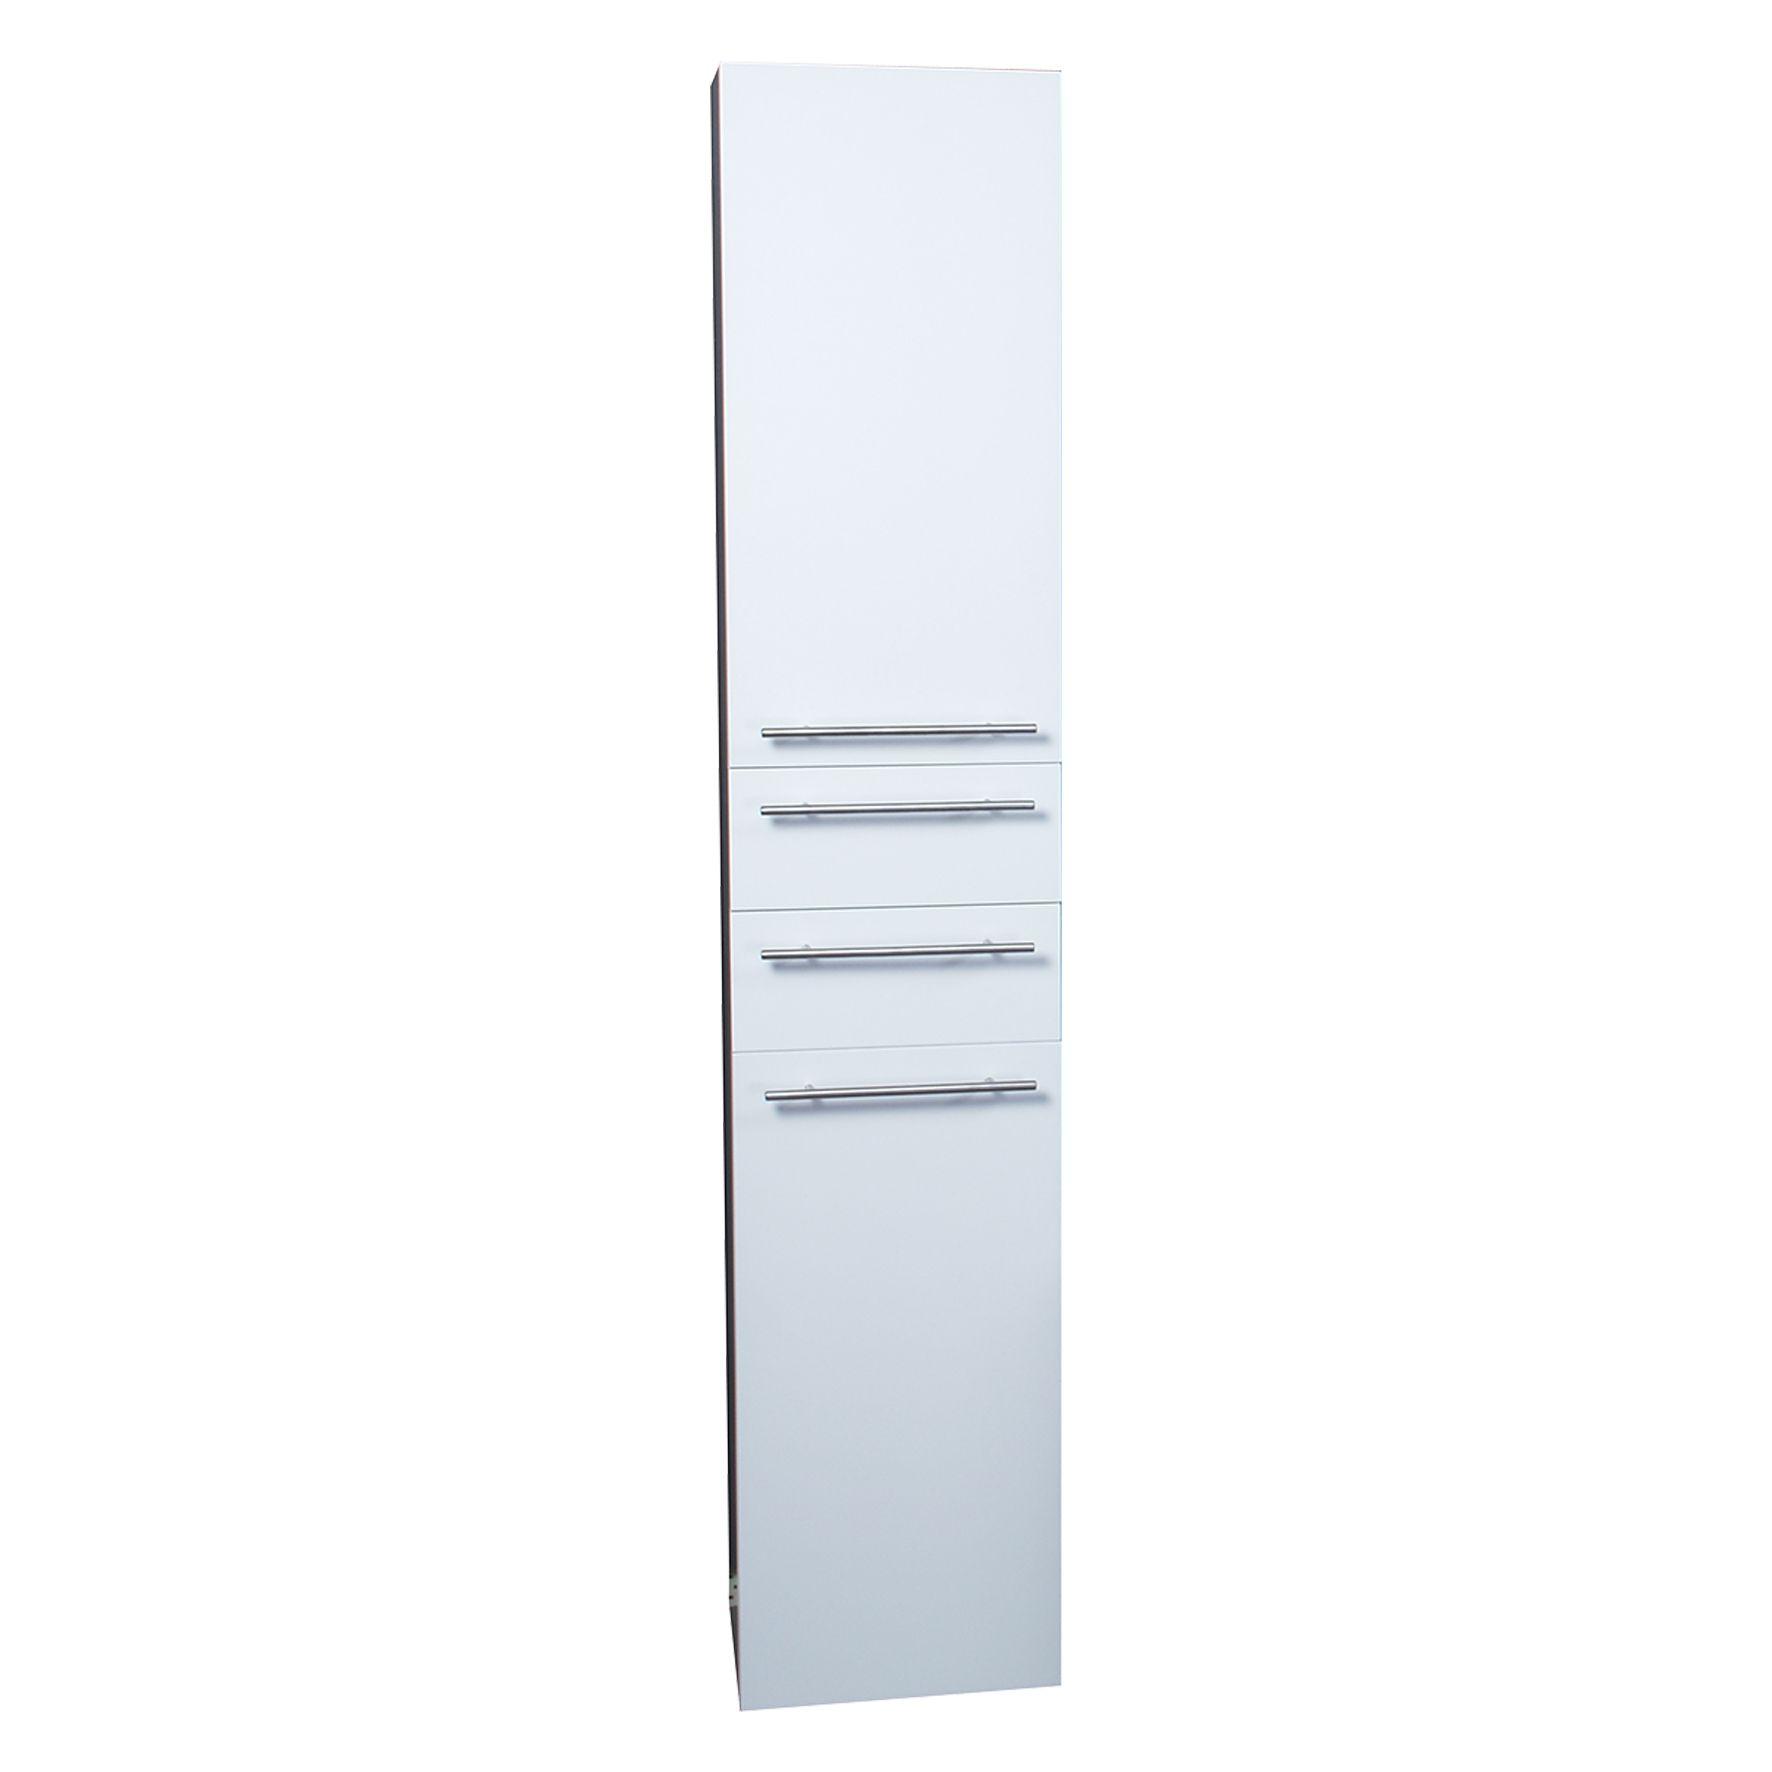 Differnz hoge kolomkast Force 176x35x30cm rechts wit